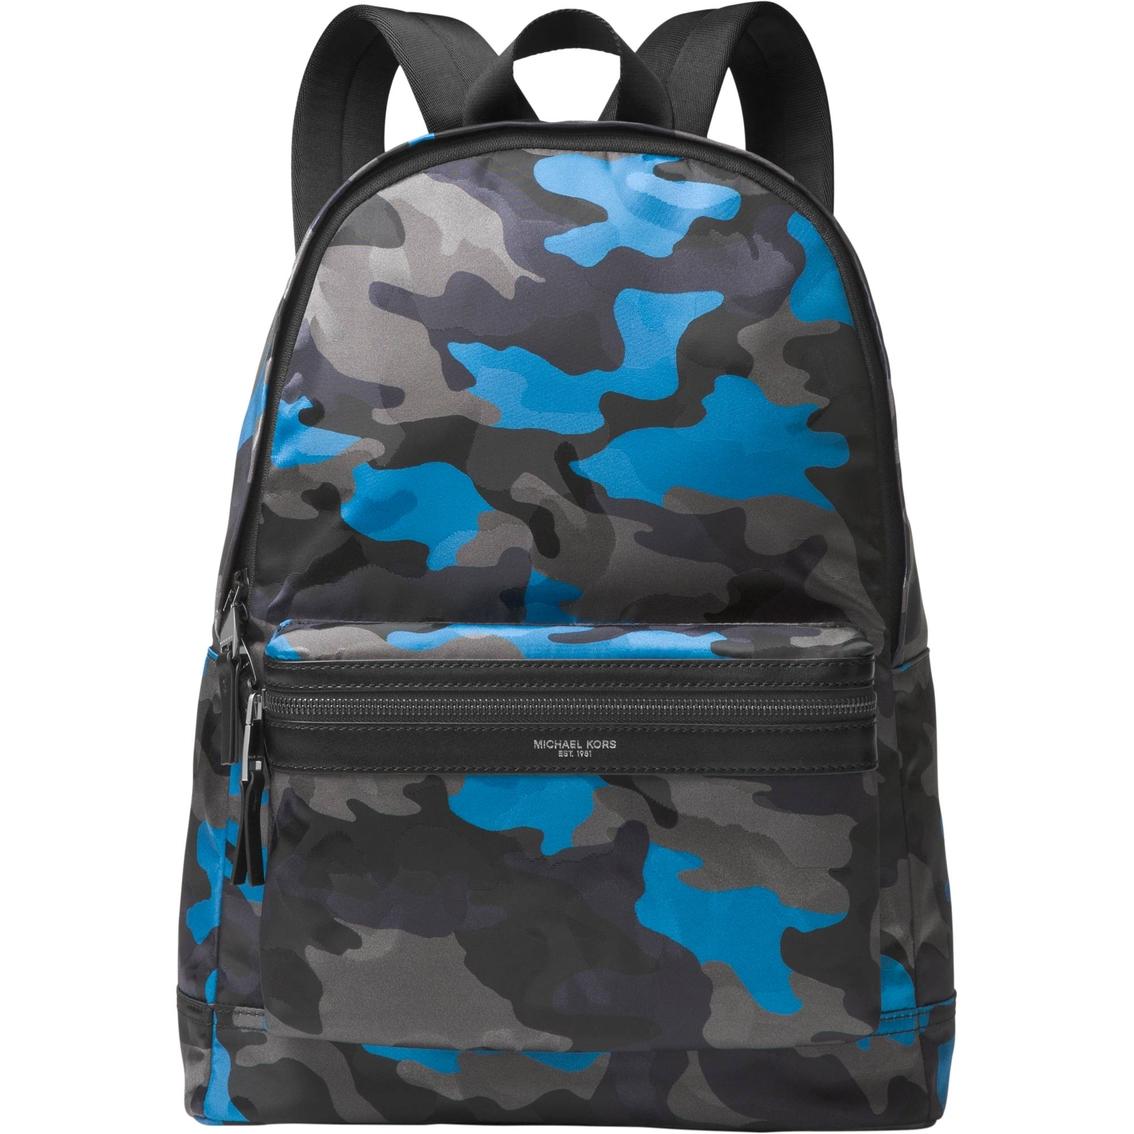 c0170c2b5e4c Michael Kors Kent Backpack Midnight | Backpacks | More | Shop The ...